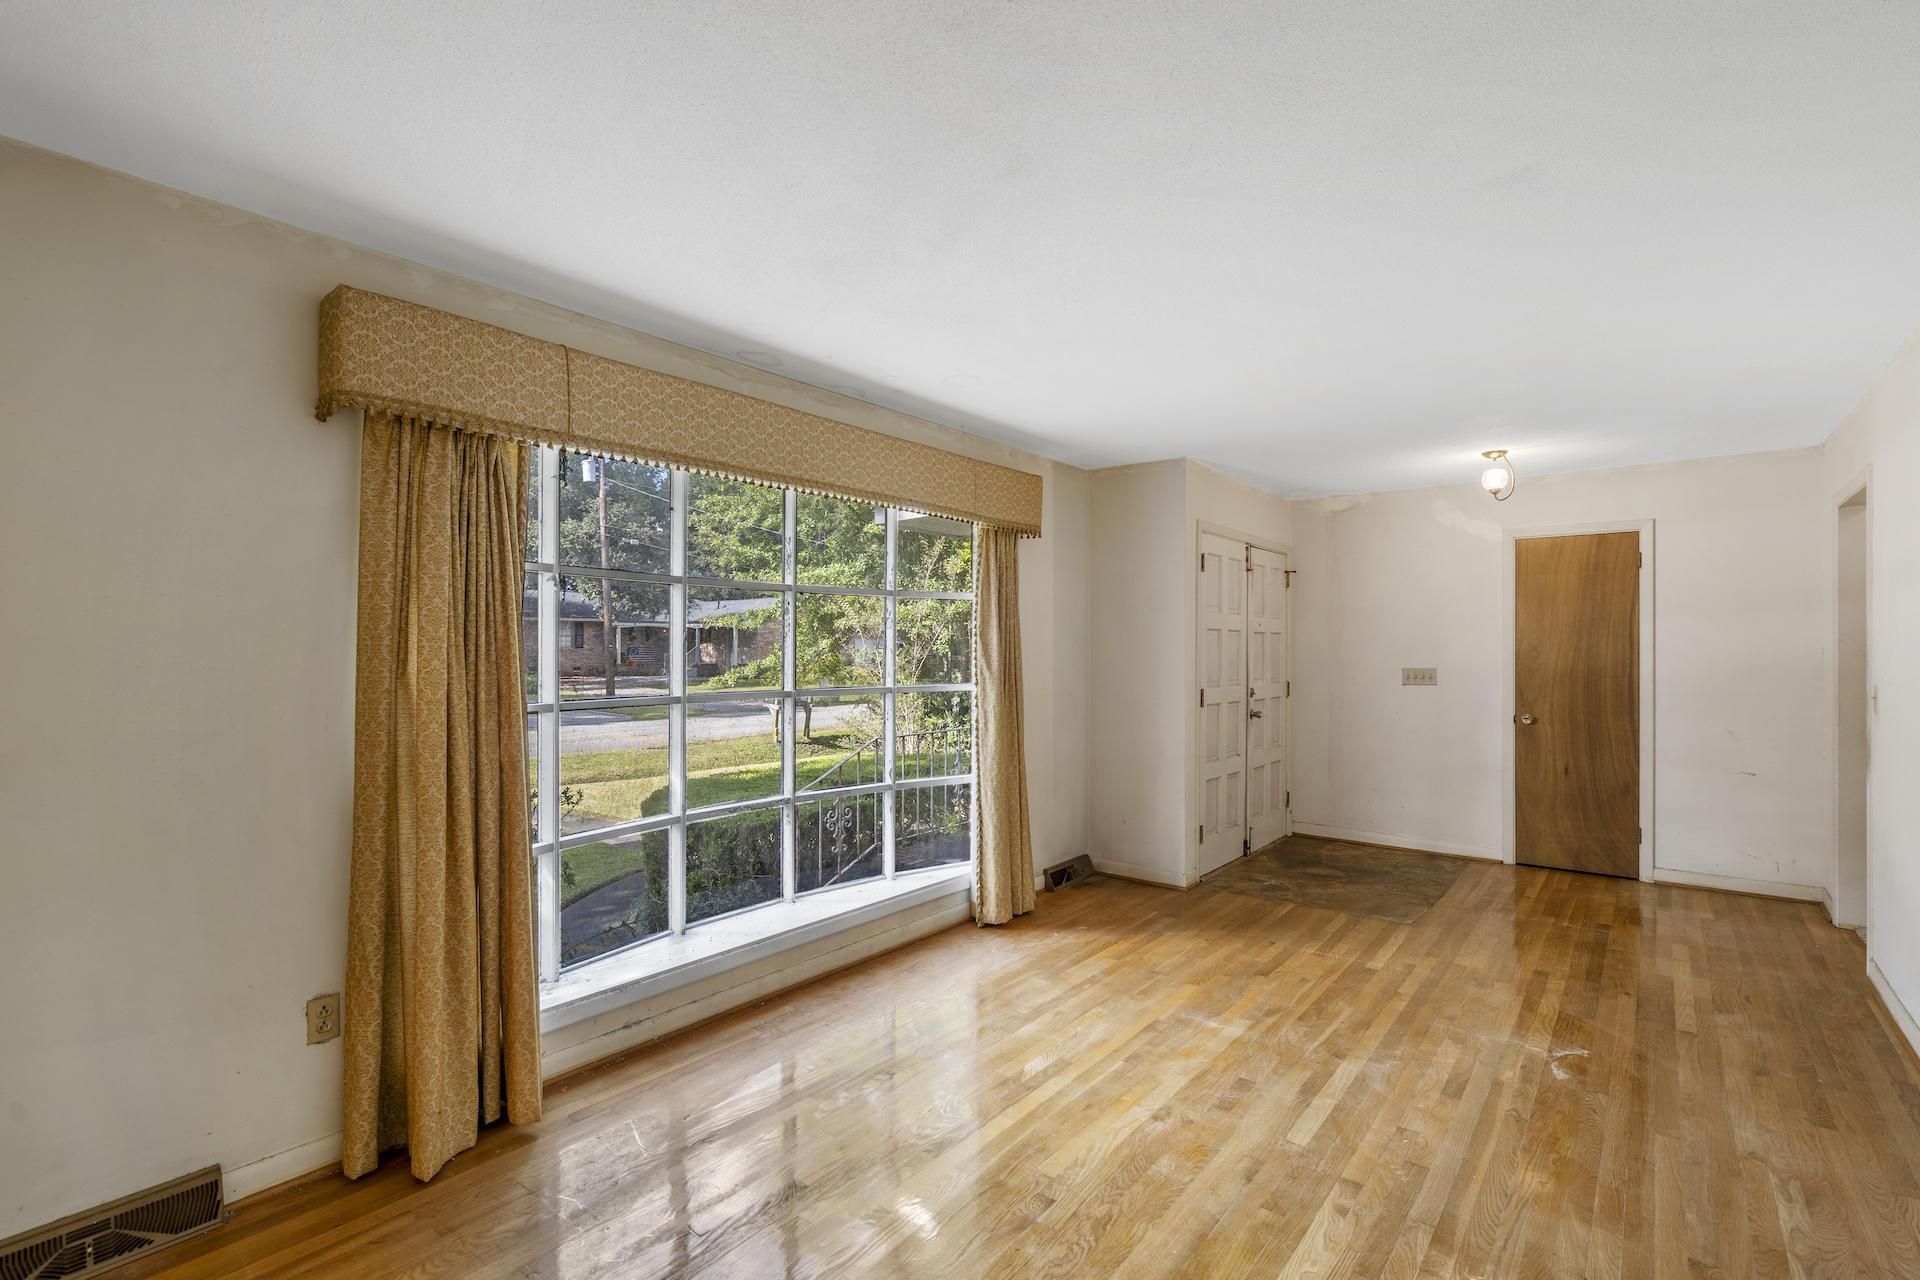 Charlestowne Estates I Homes For Sale - 1137 Culpepper, Charleston, SC - 1